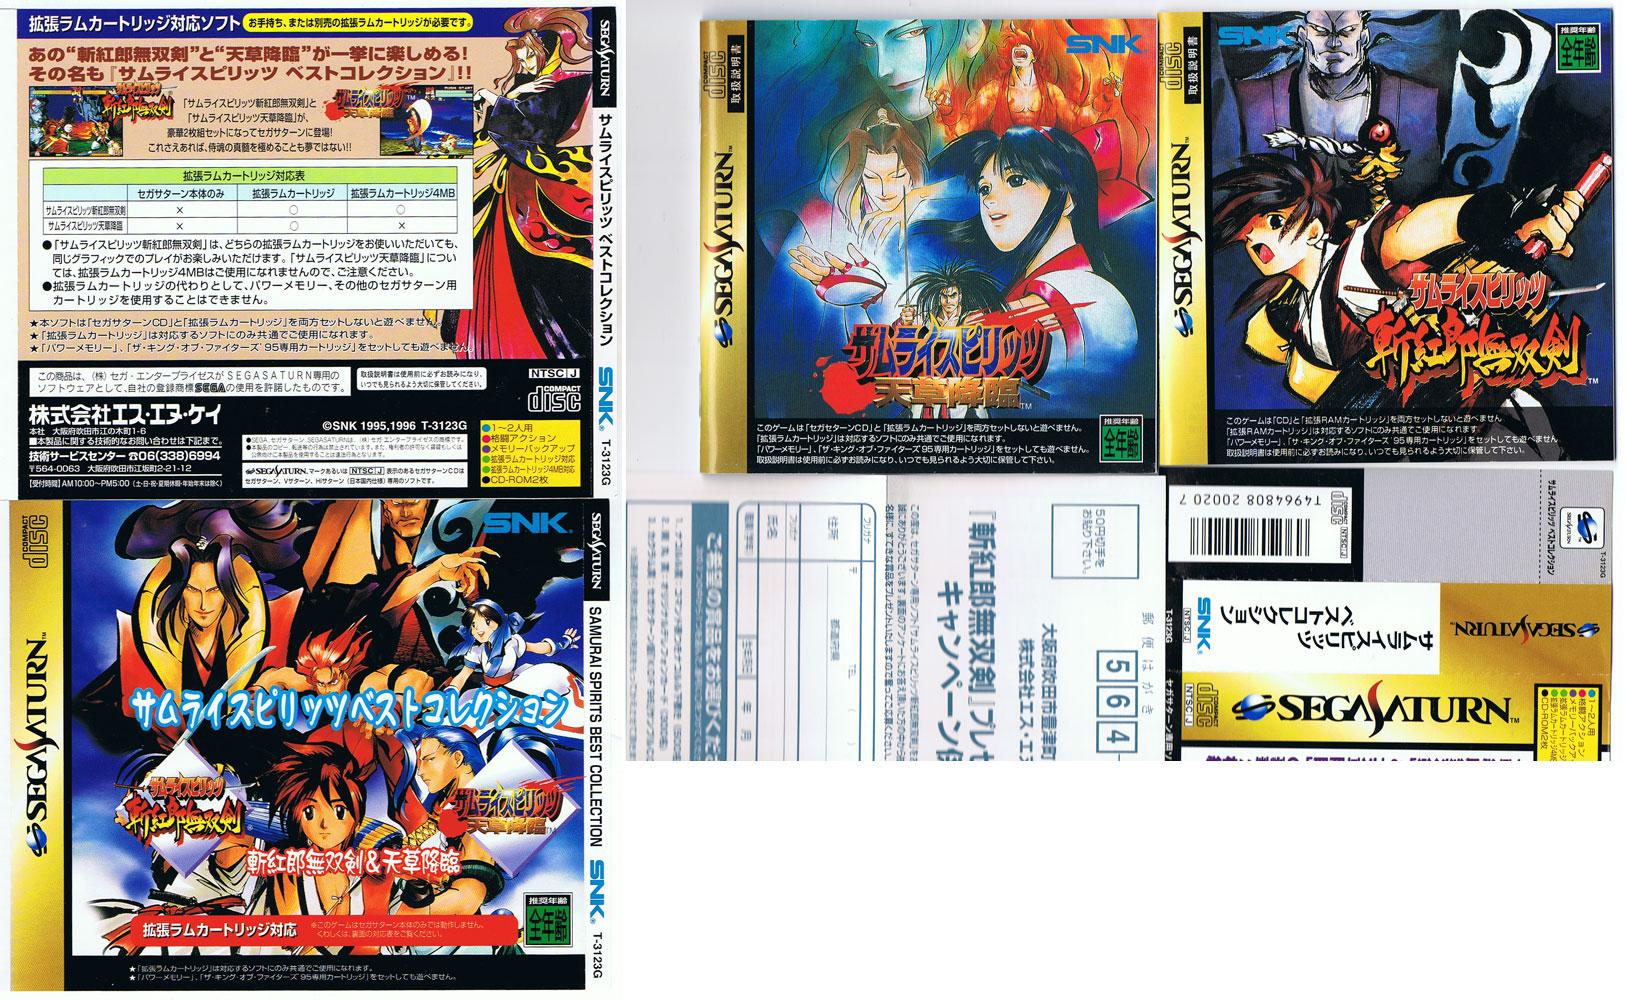 Samurai Spirits Best Collection from SNK - Sega Saturn